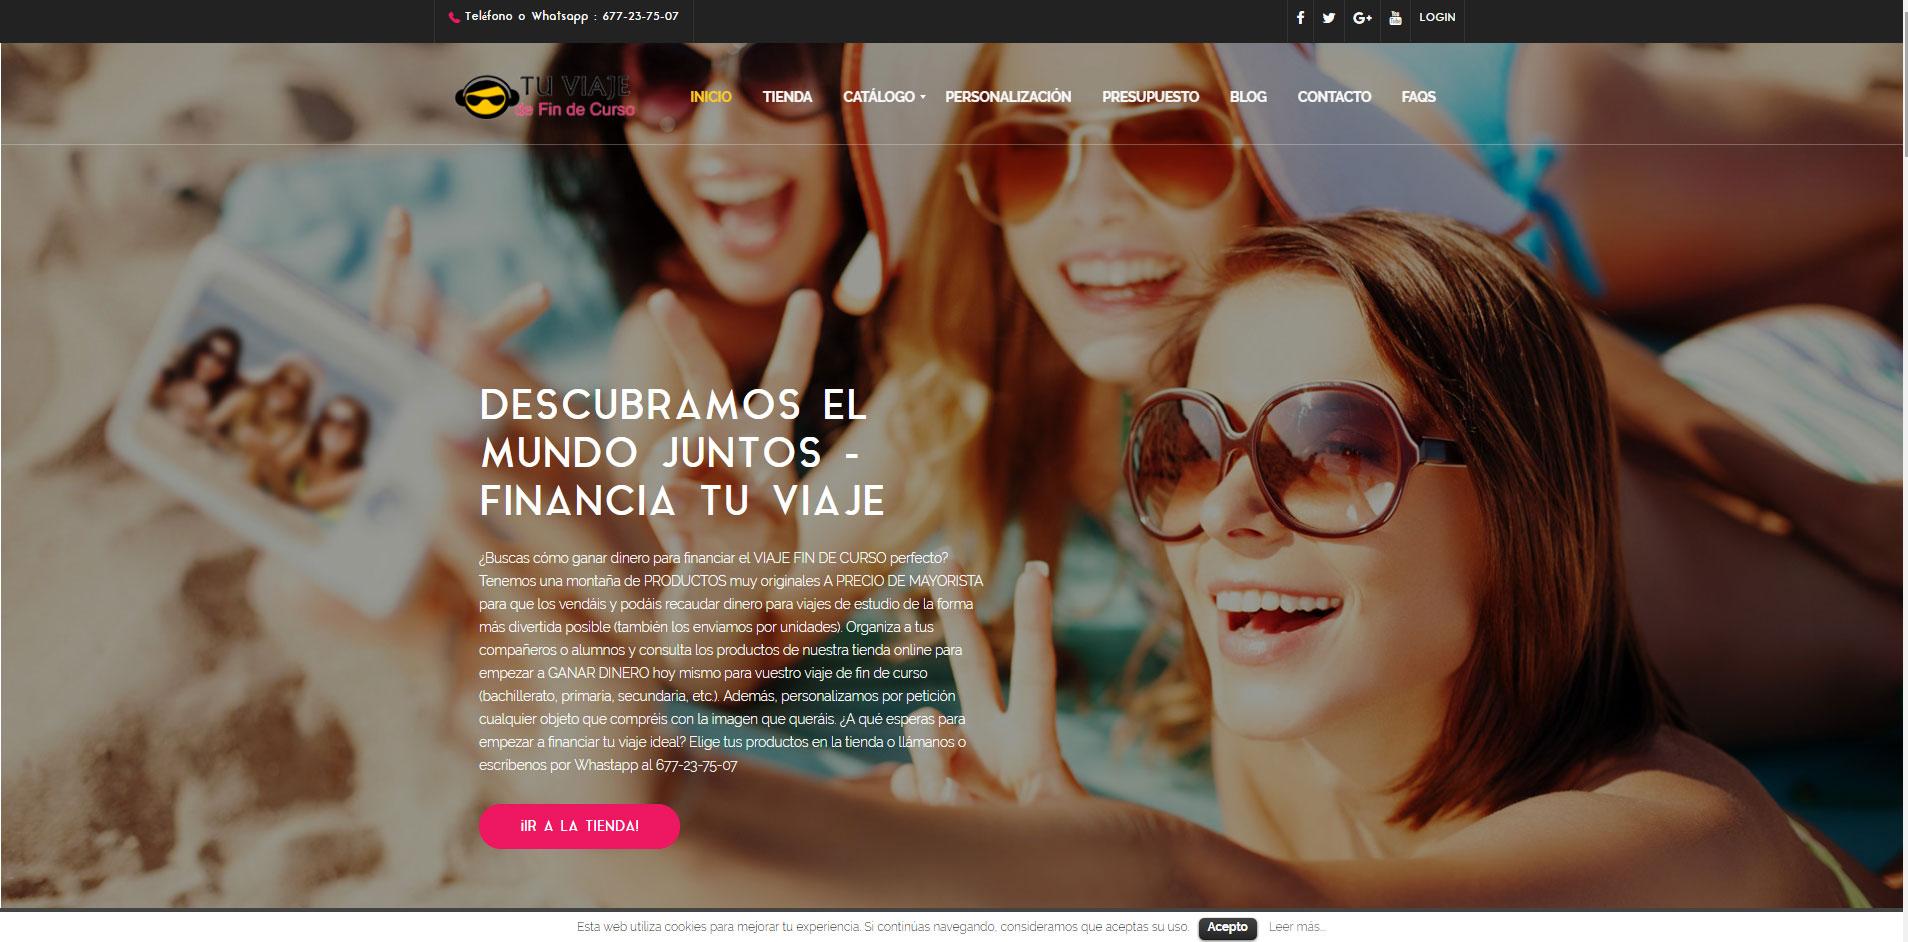 portafolio-diseno-web-marisol-tvdfdc